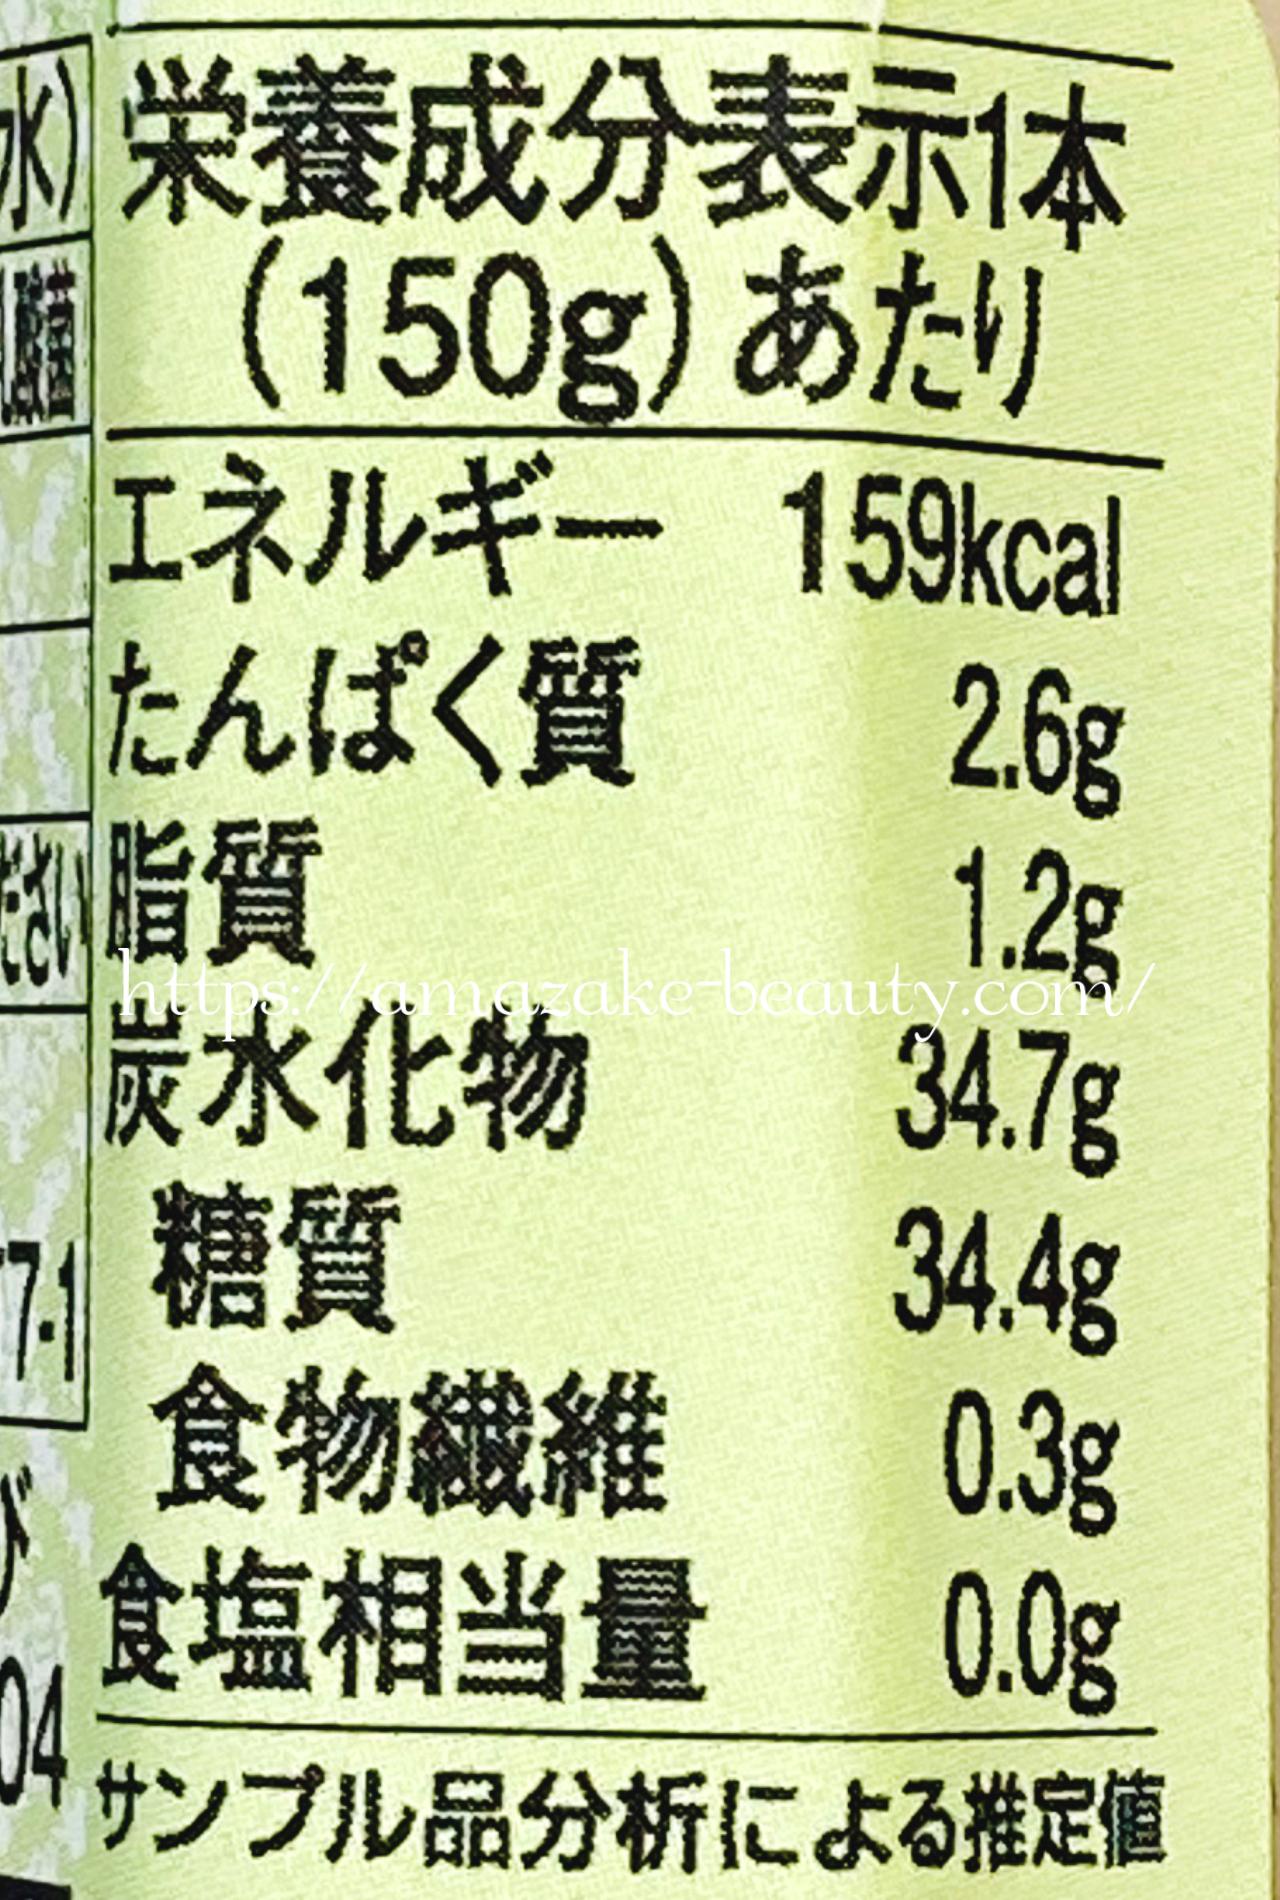 [amazake]maru[hokkori amazake monogatari(hebesu)](nutrition information)